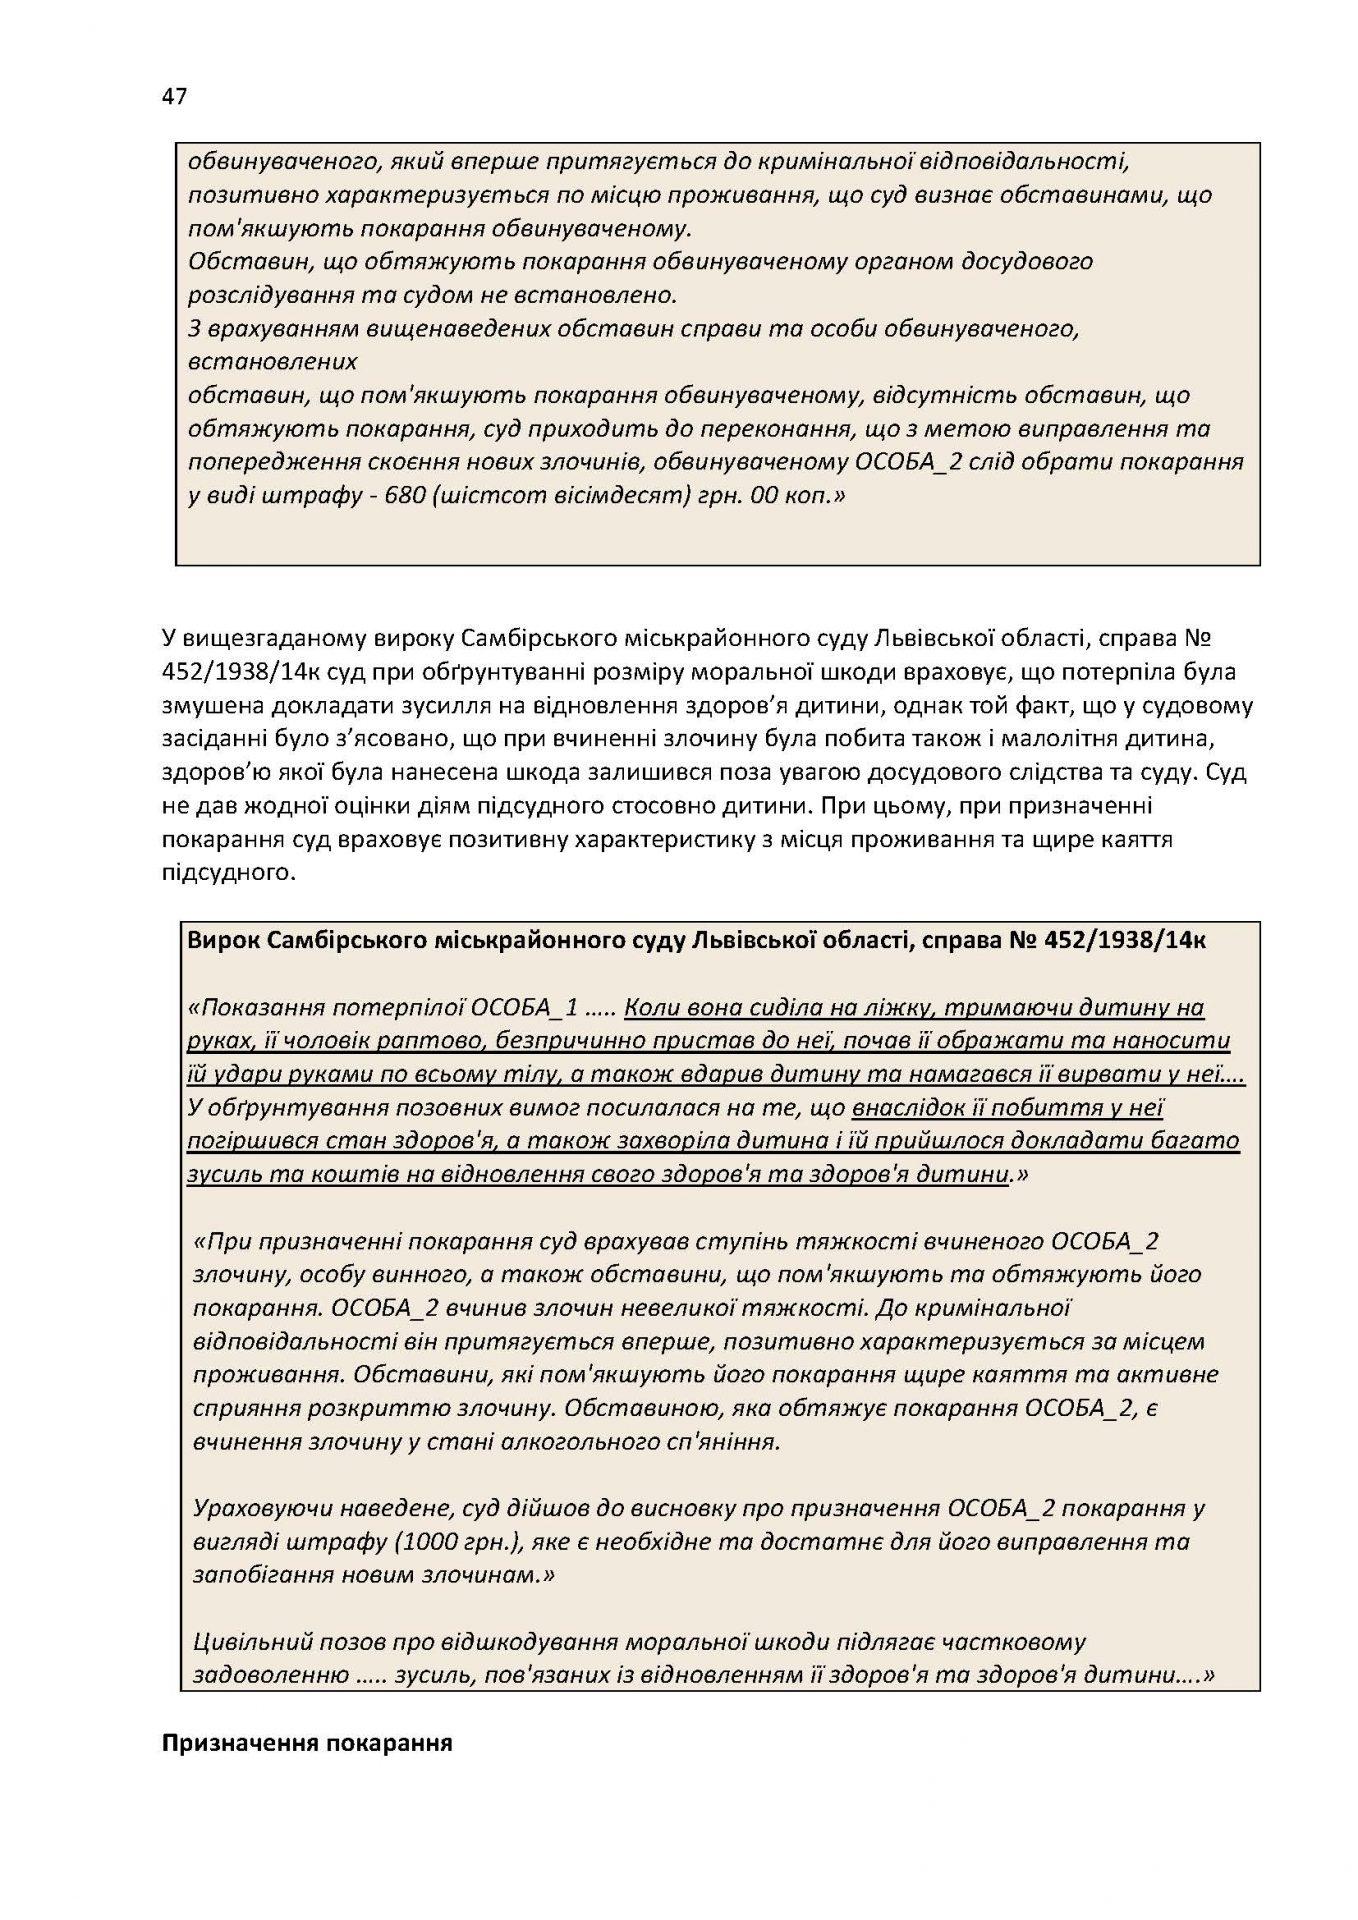 Draft Report monitoring print USAID_Страница_47